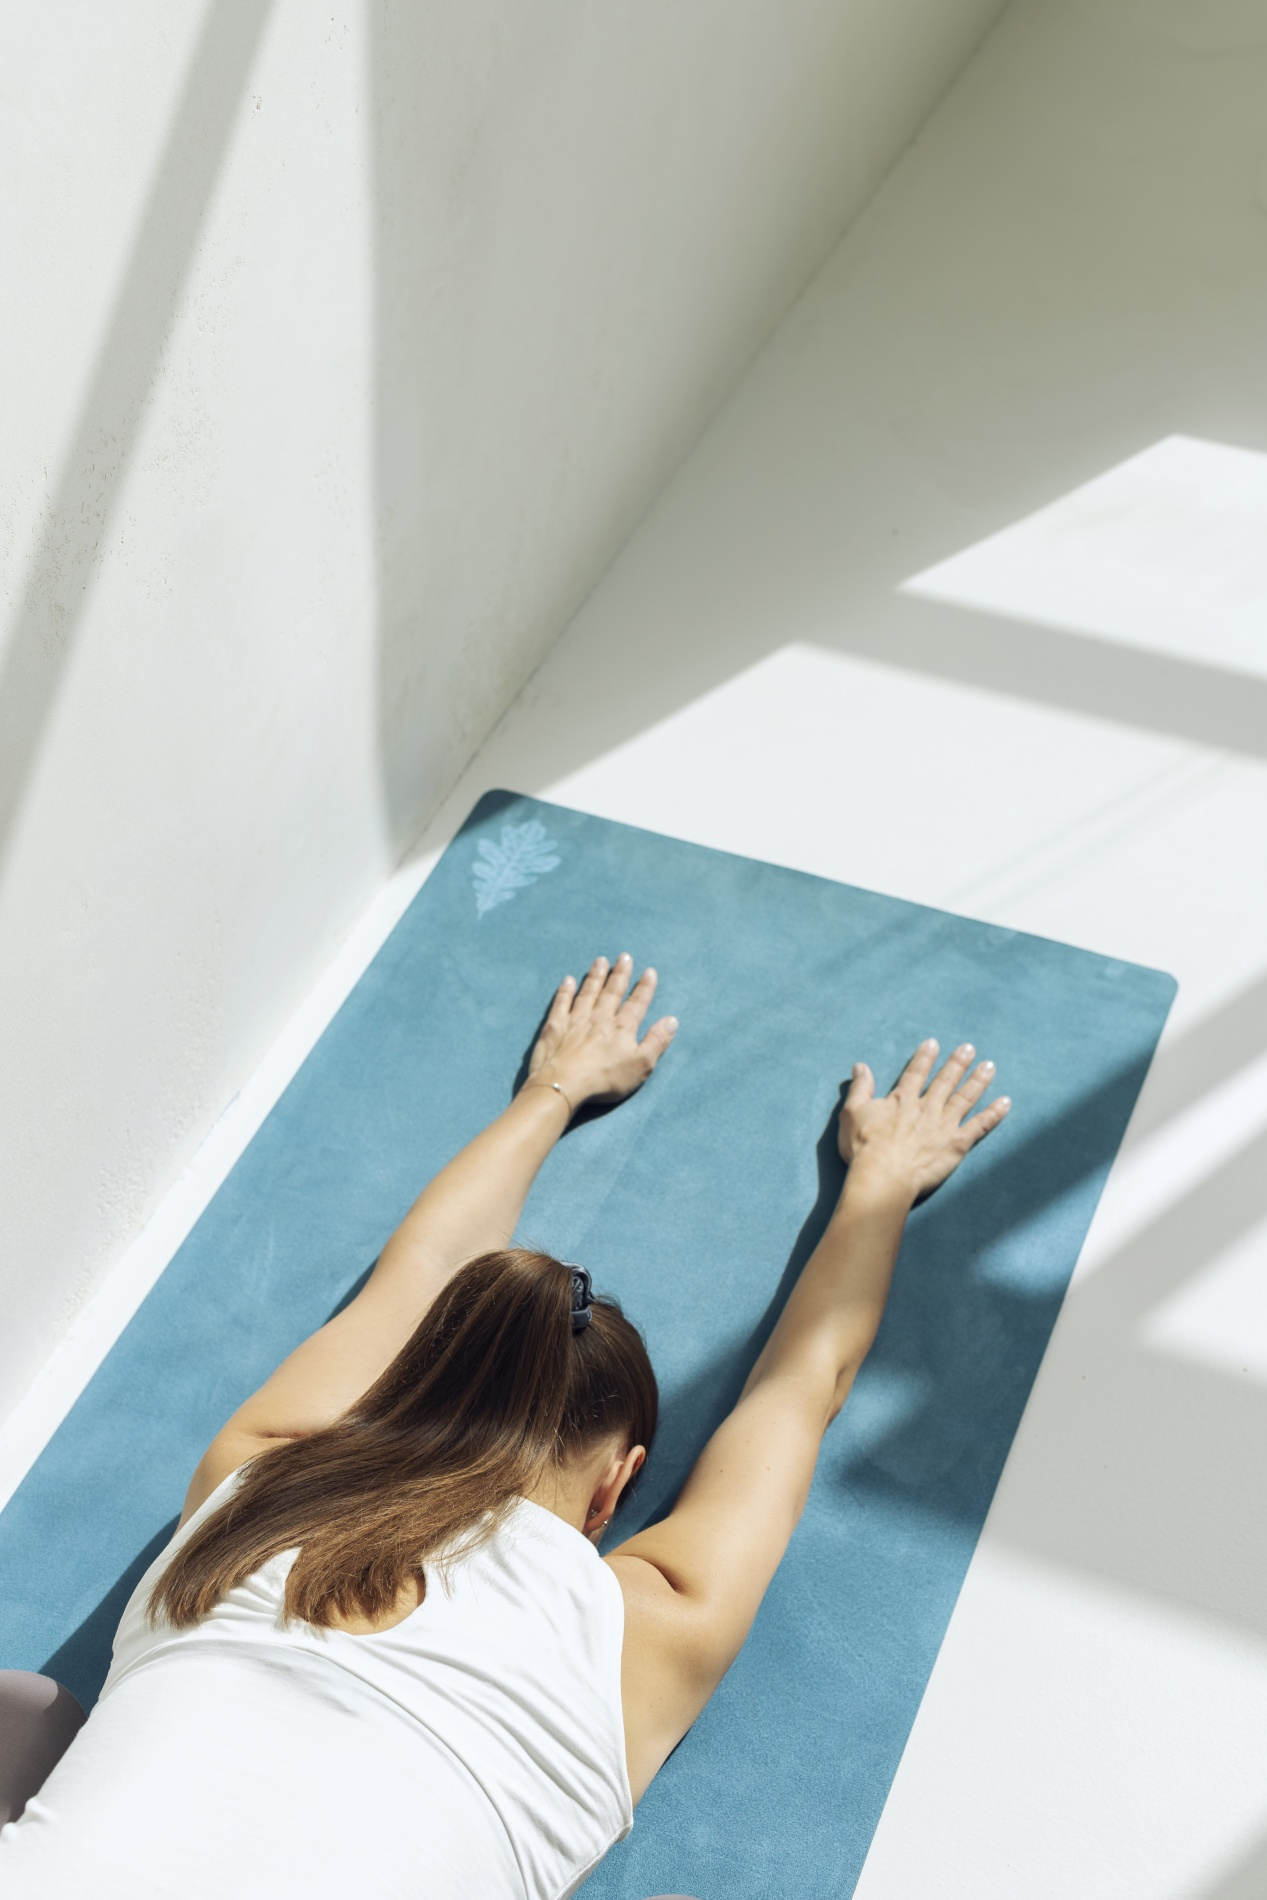 Mata Travel Deep Ocean - Yoga Retreatment | JestemSlow.pl